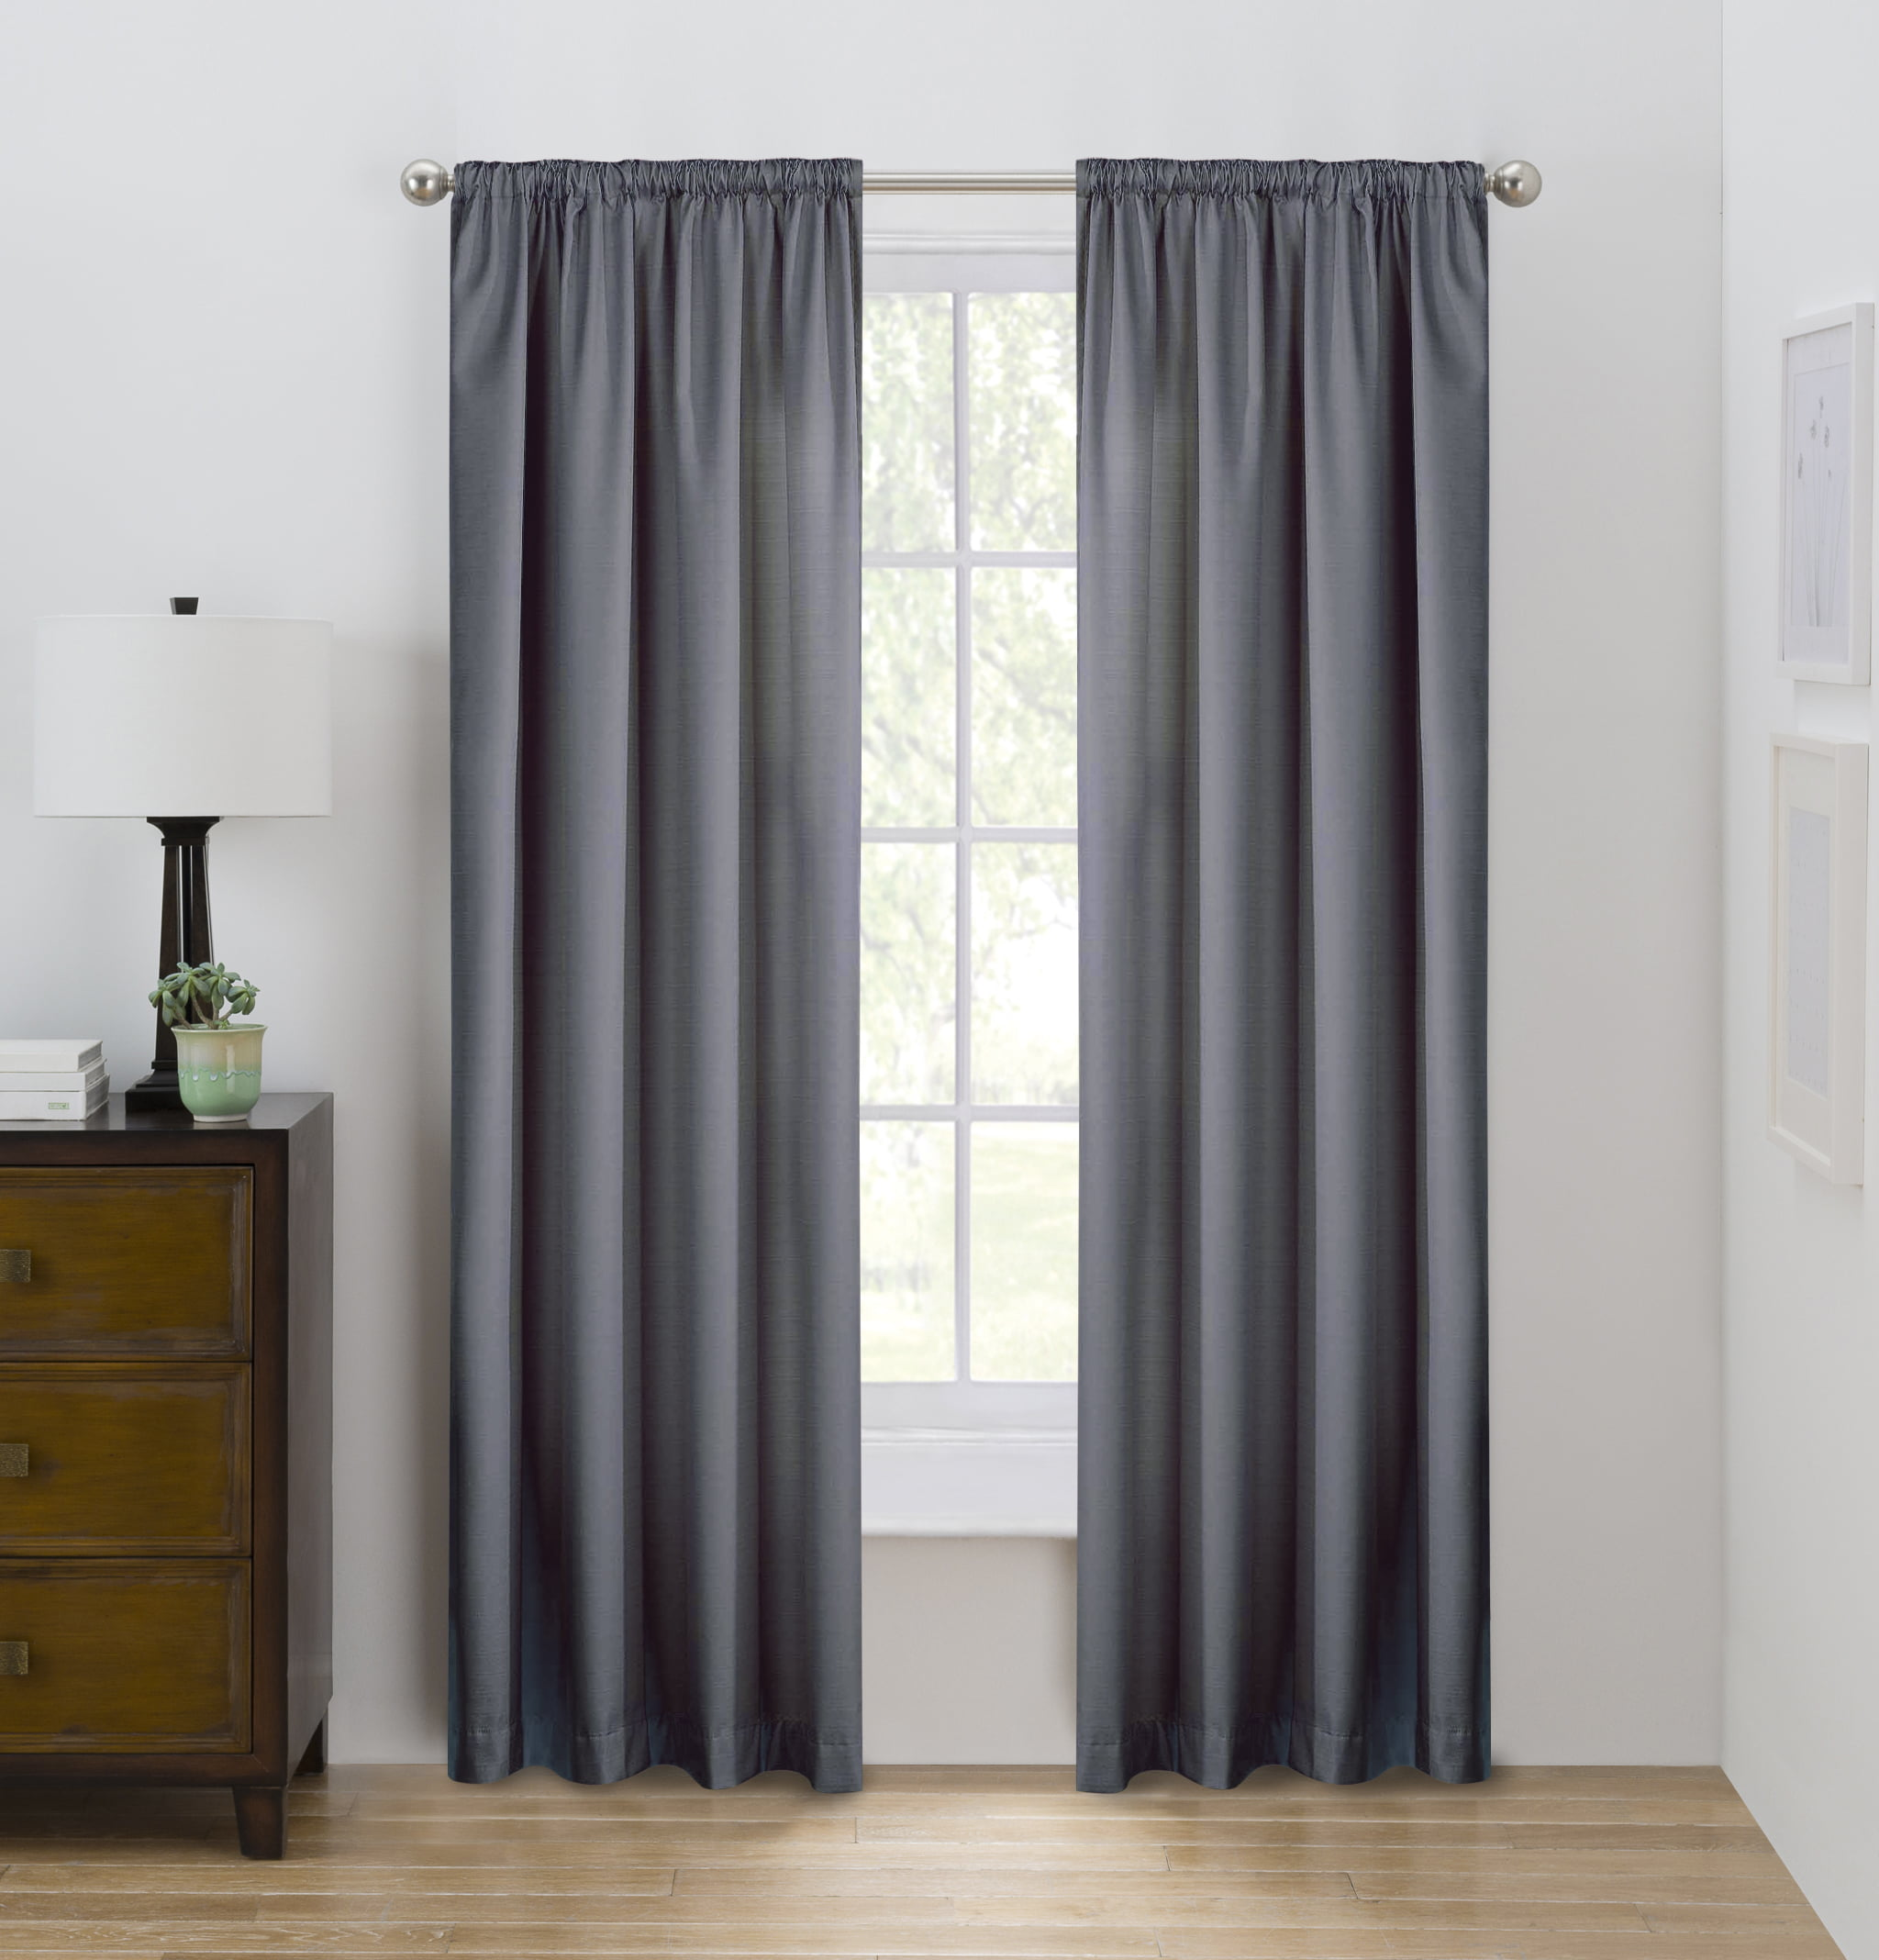 Eclipse Draft Stopper Solid Color Room Darkening Rod Pocket Single Curtain Panel Gray Flannel 42 X 84 Walmart Com Walmart Com